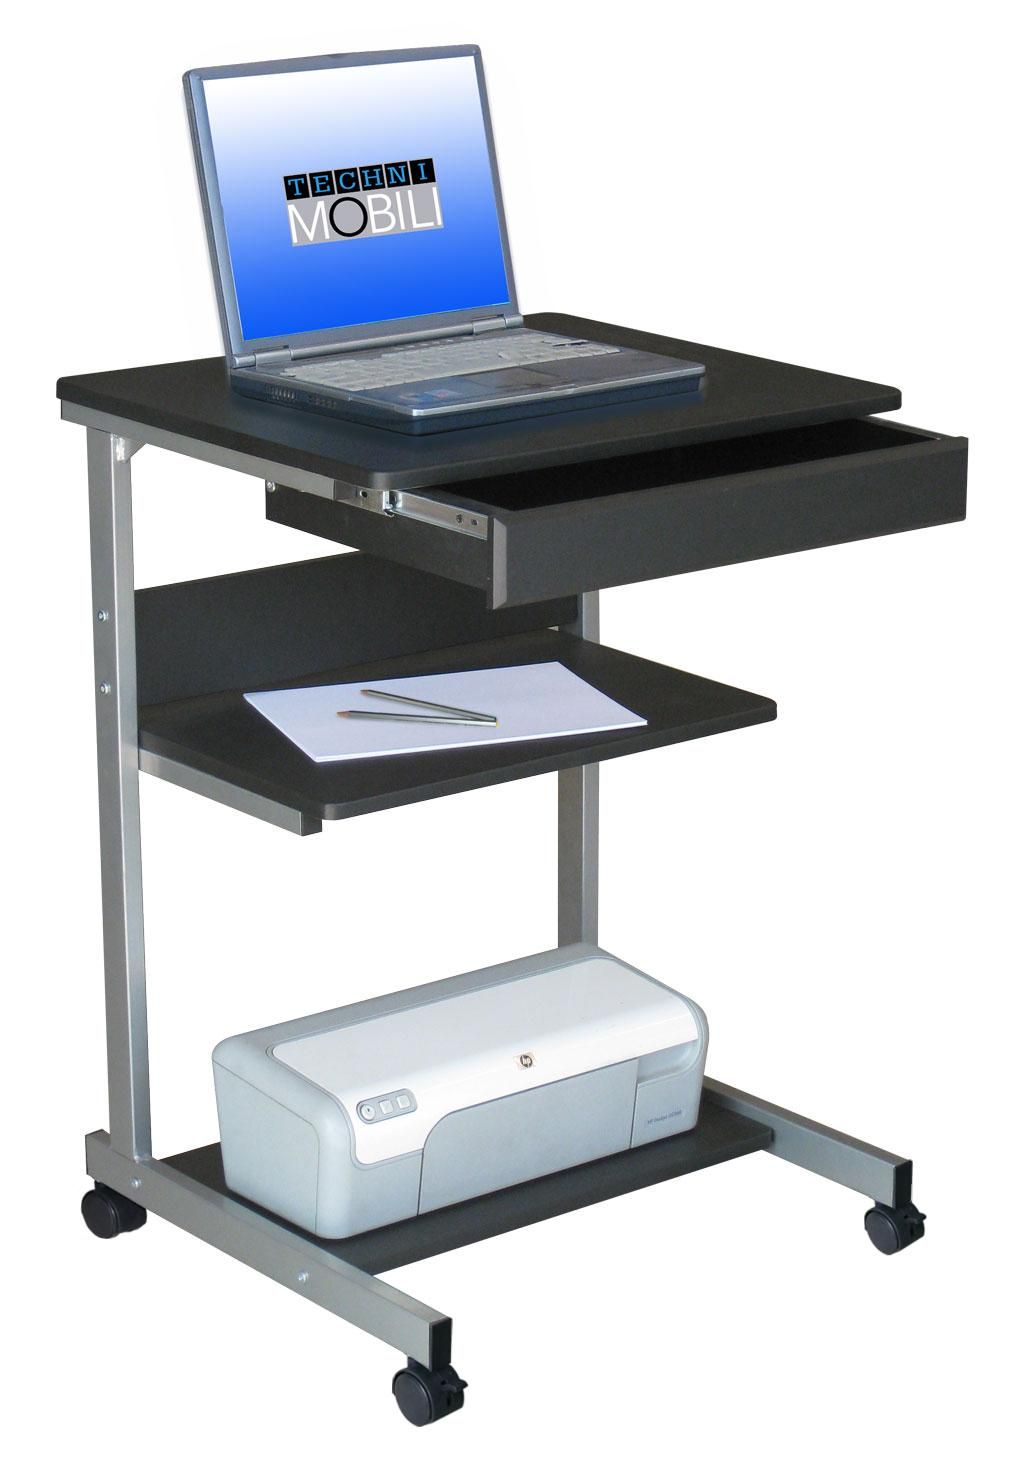 Techni Mobili Laptop Stand by OJ Commerce RTA-B018-GPH06 - $52.08